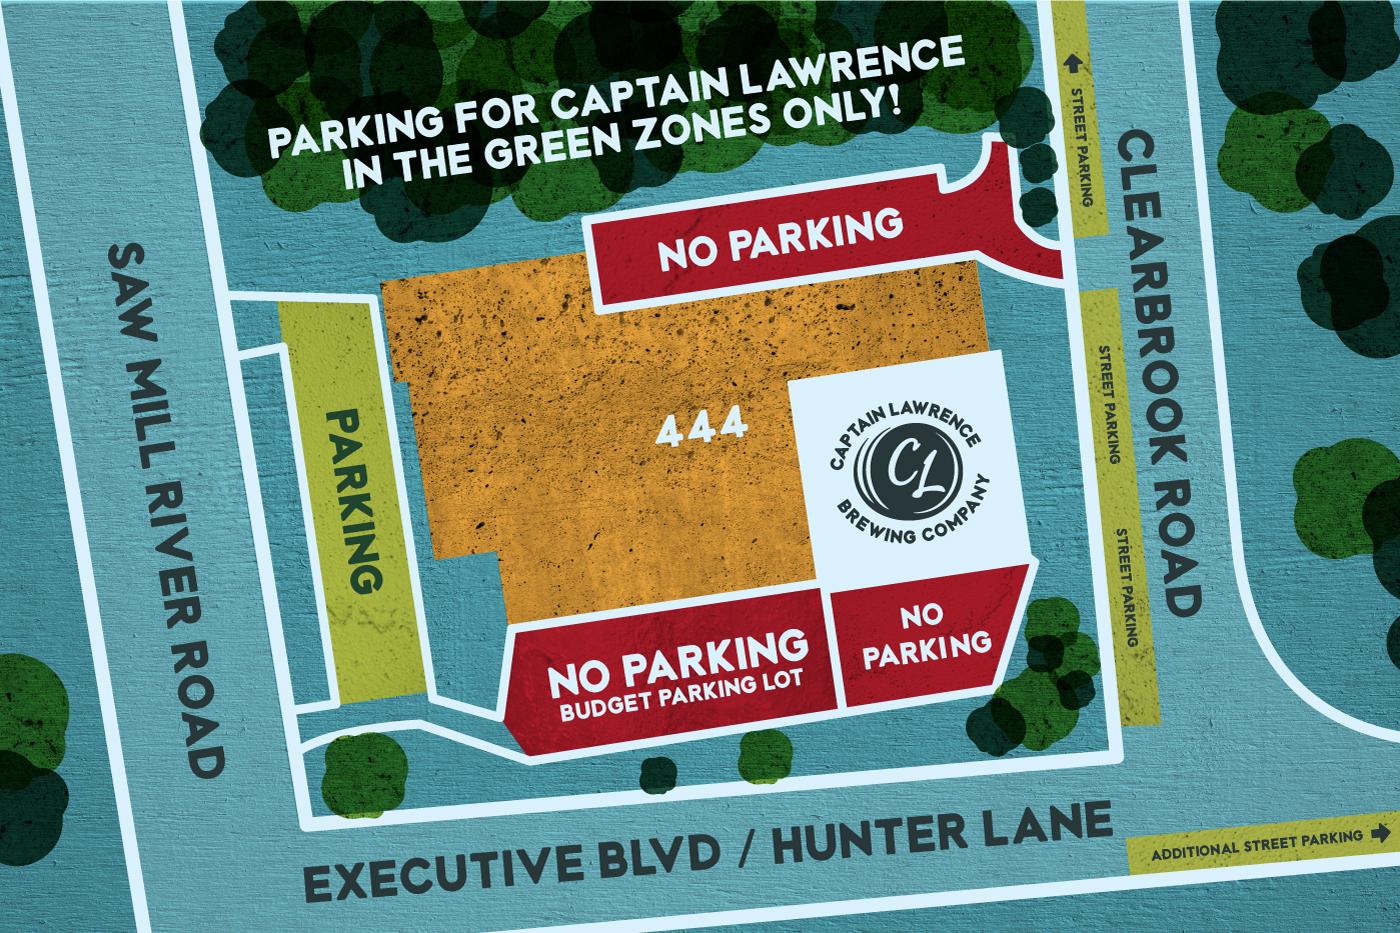 Captain Lawrence Parking map